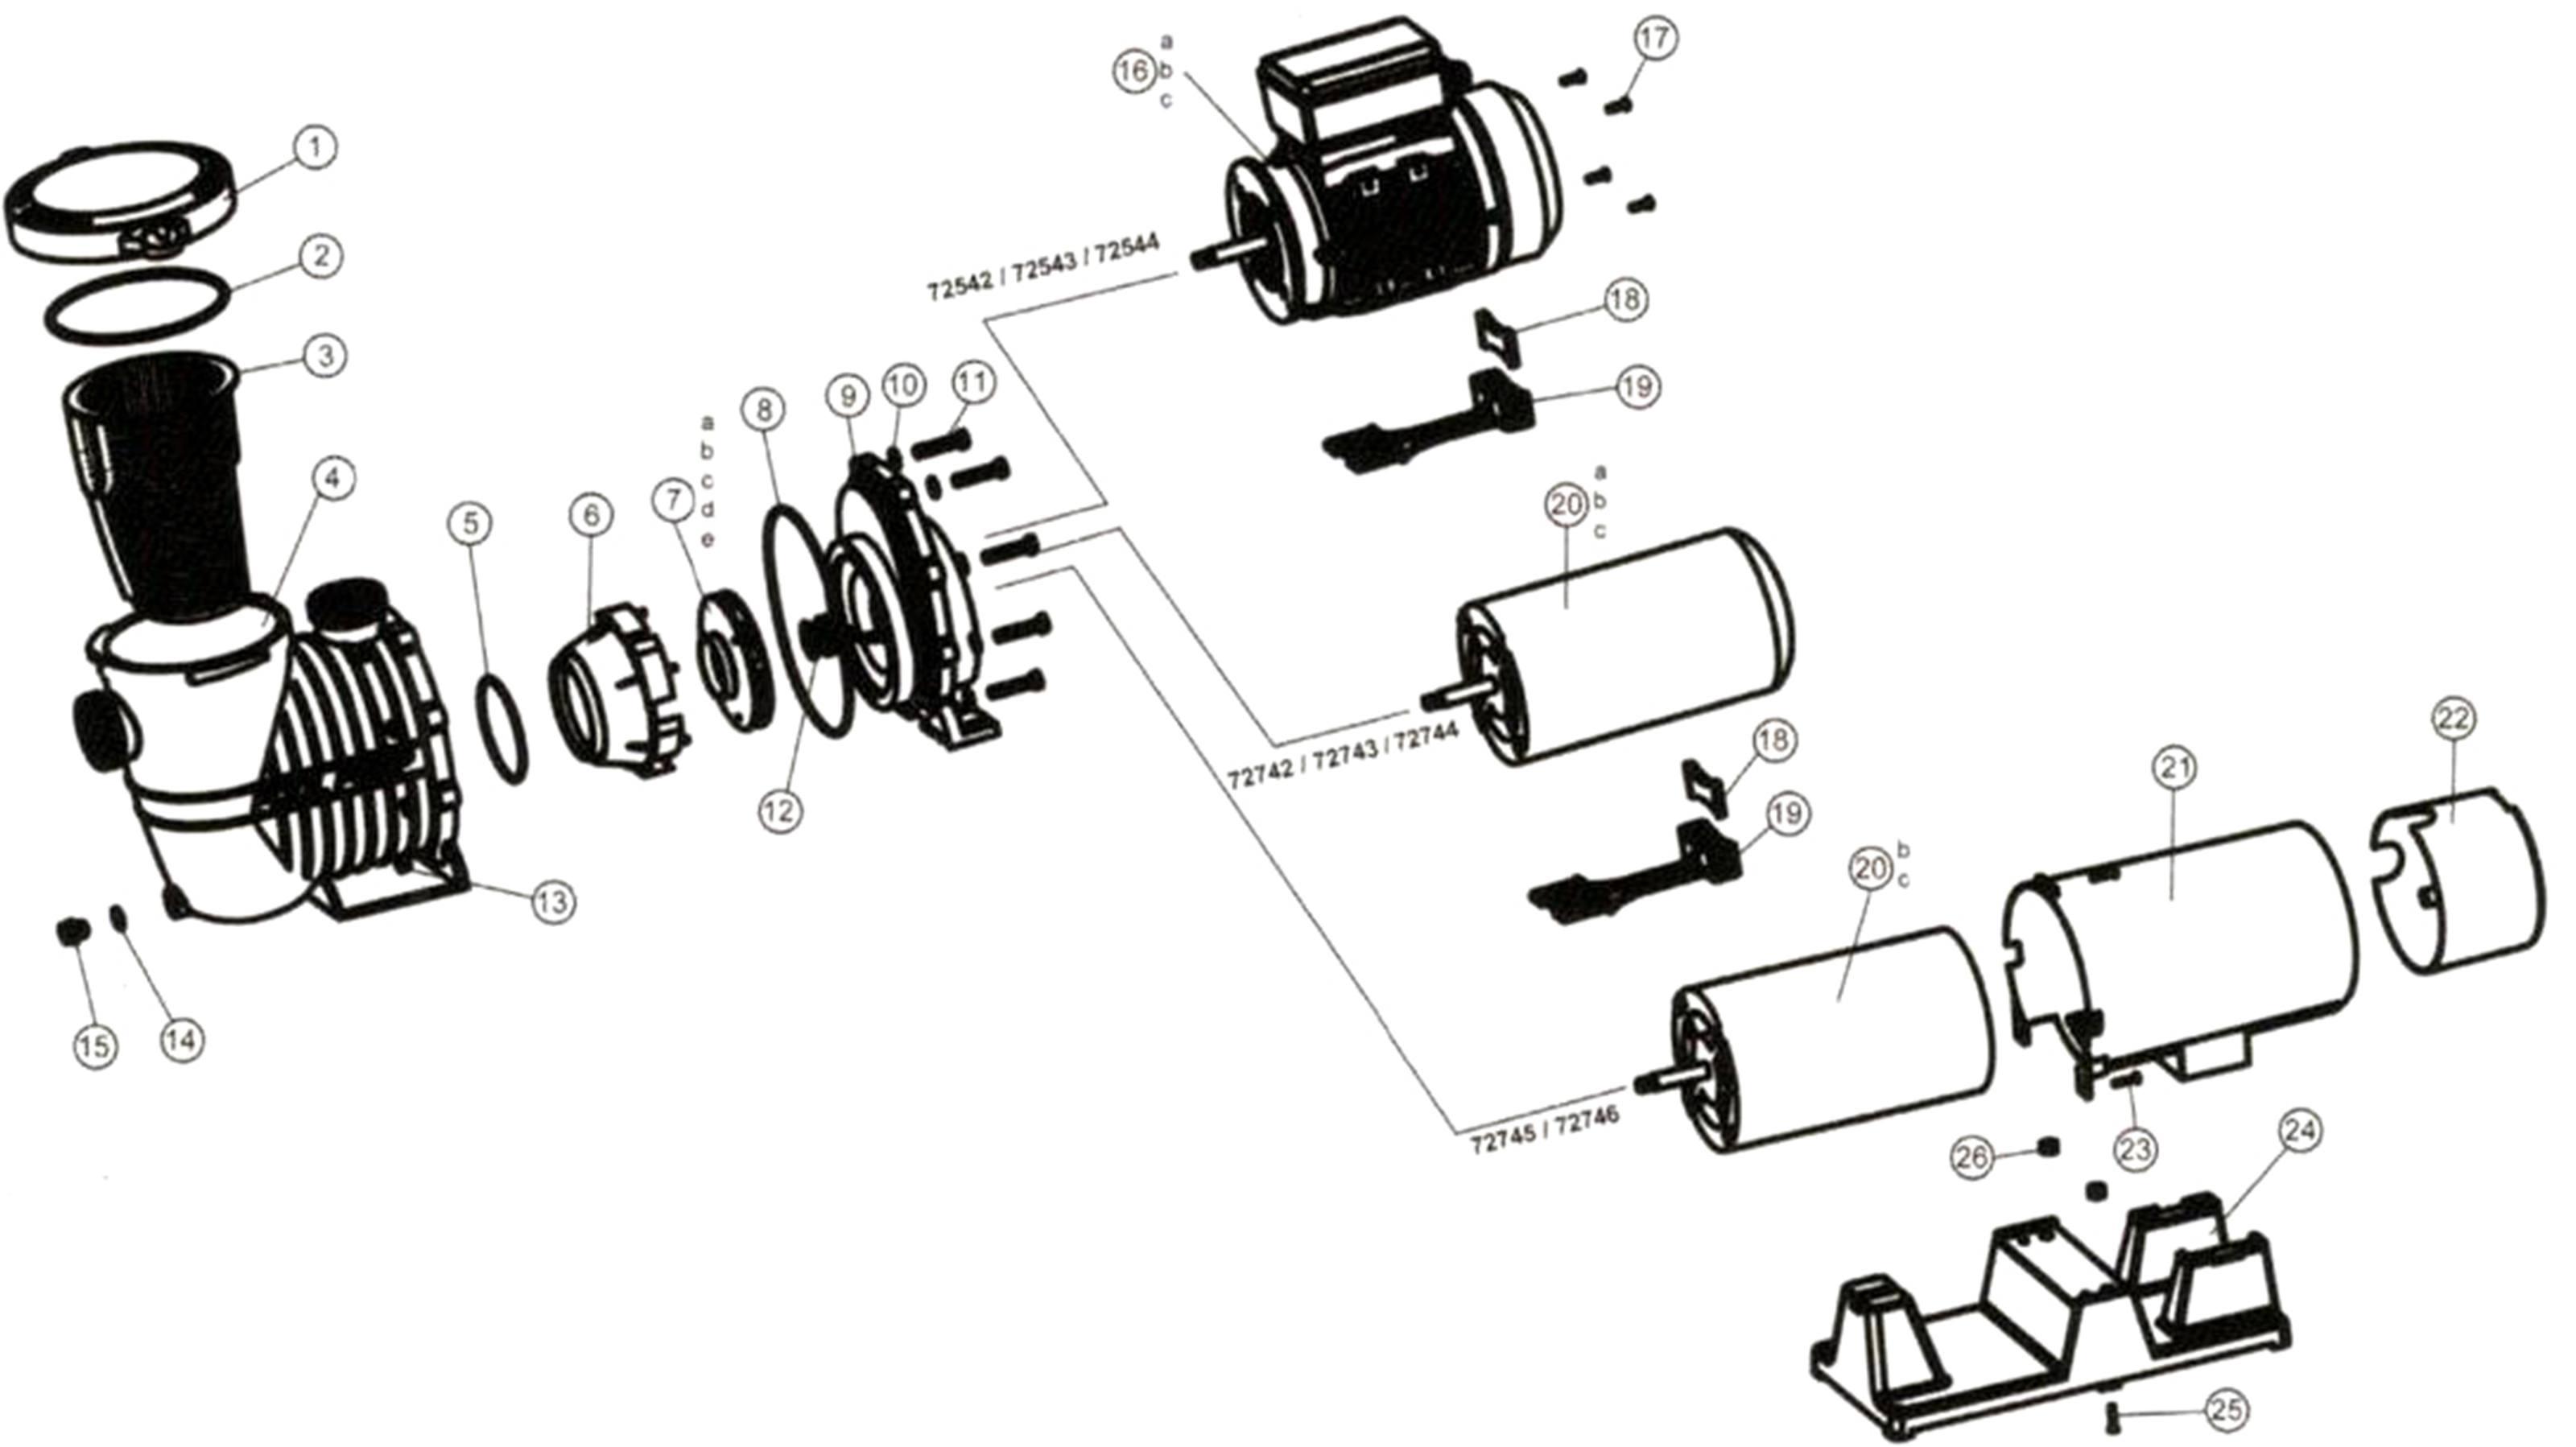 Intex Pool Pump Wiring Diagram Mallory Hyfire D70 7 8